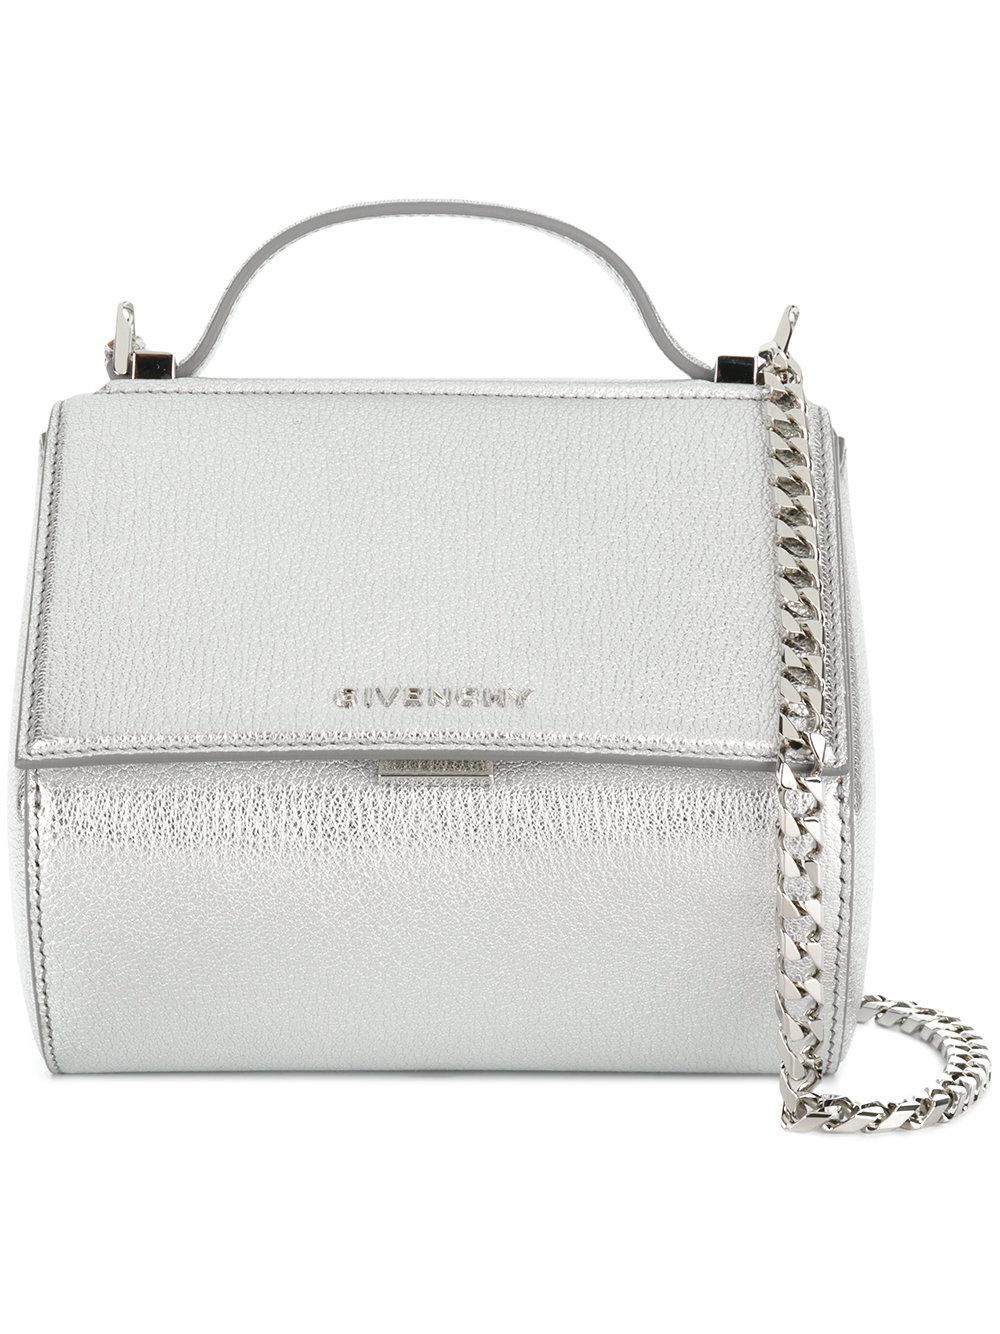 ada6da1237 Online Shop Givenchy